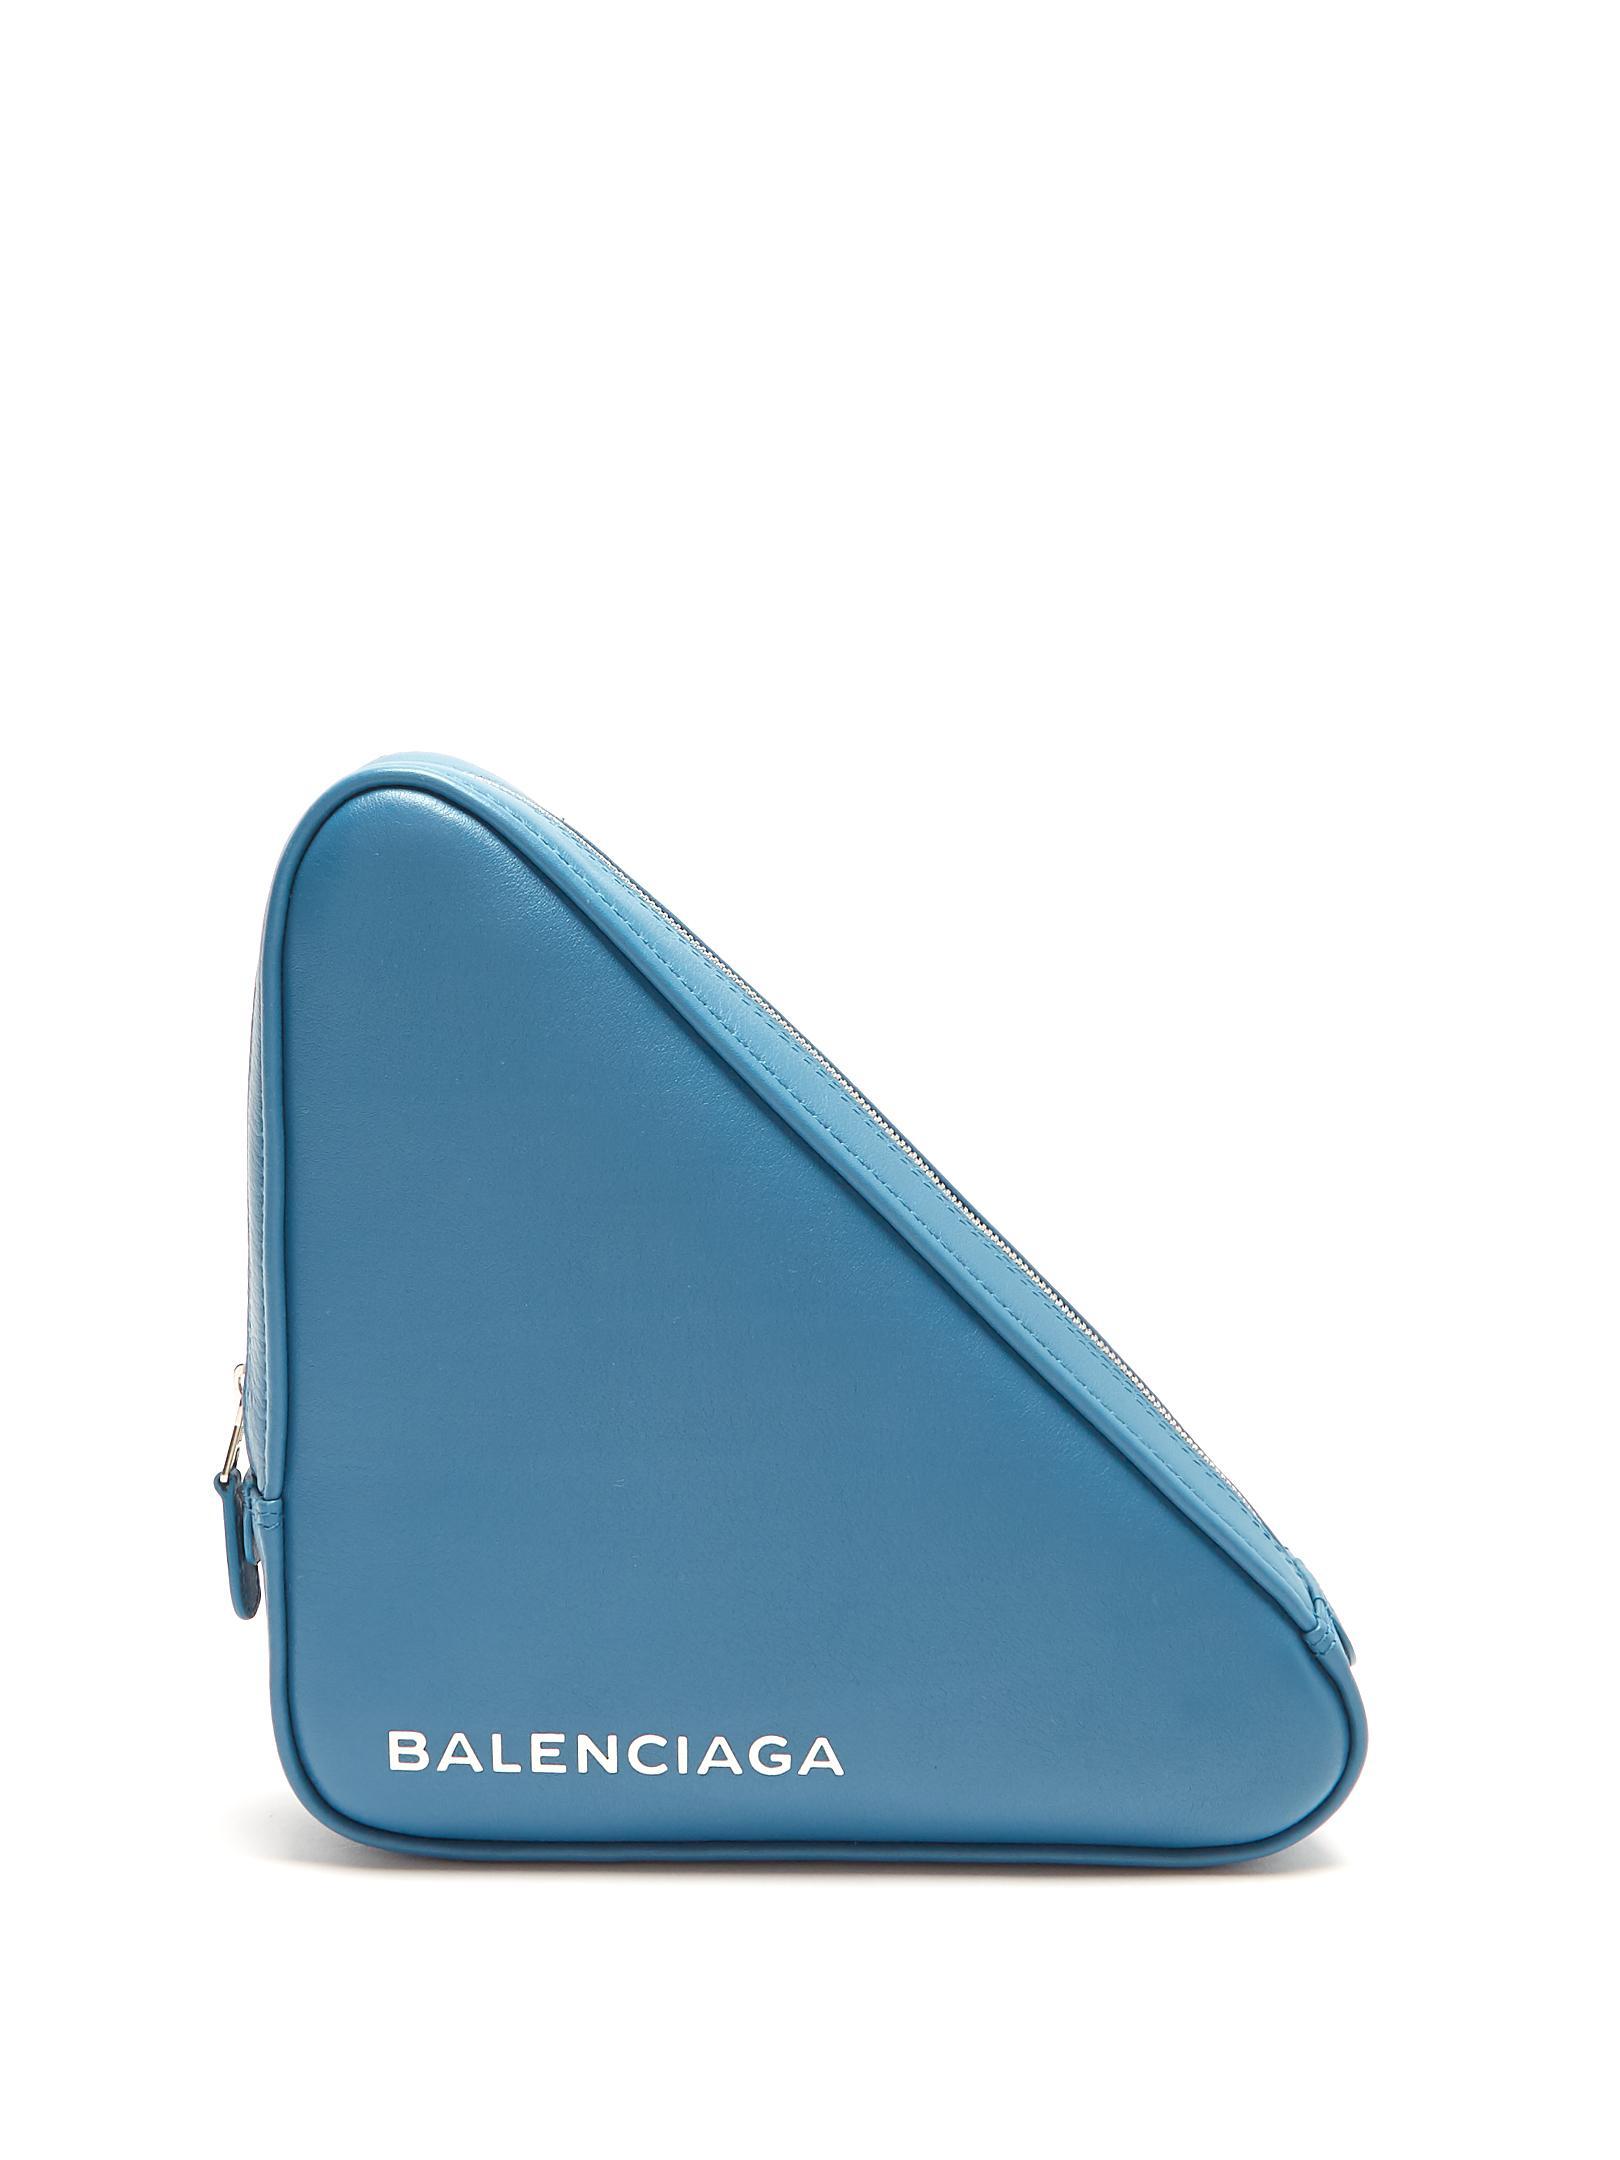 Embrayage En Cuir Triangle Bleu Balenciaga Sortie À Vendre JXKo9DZom